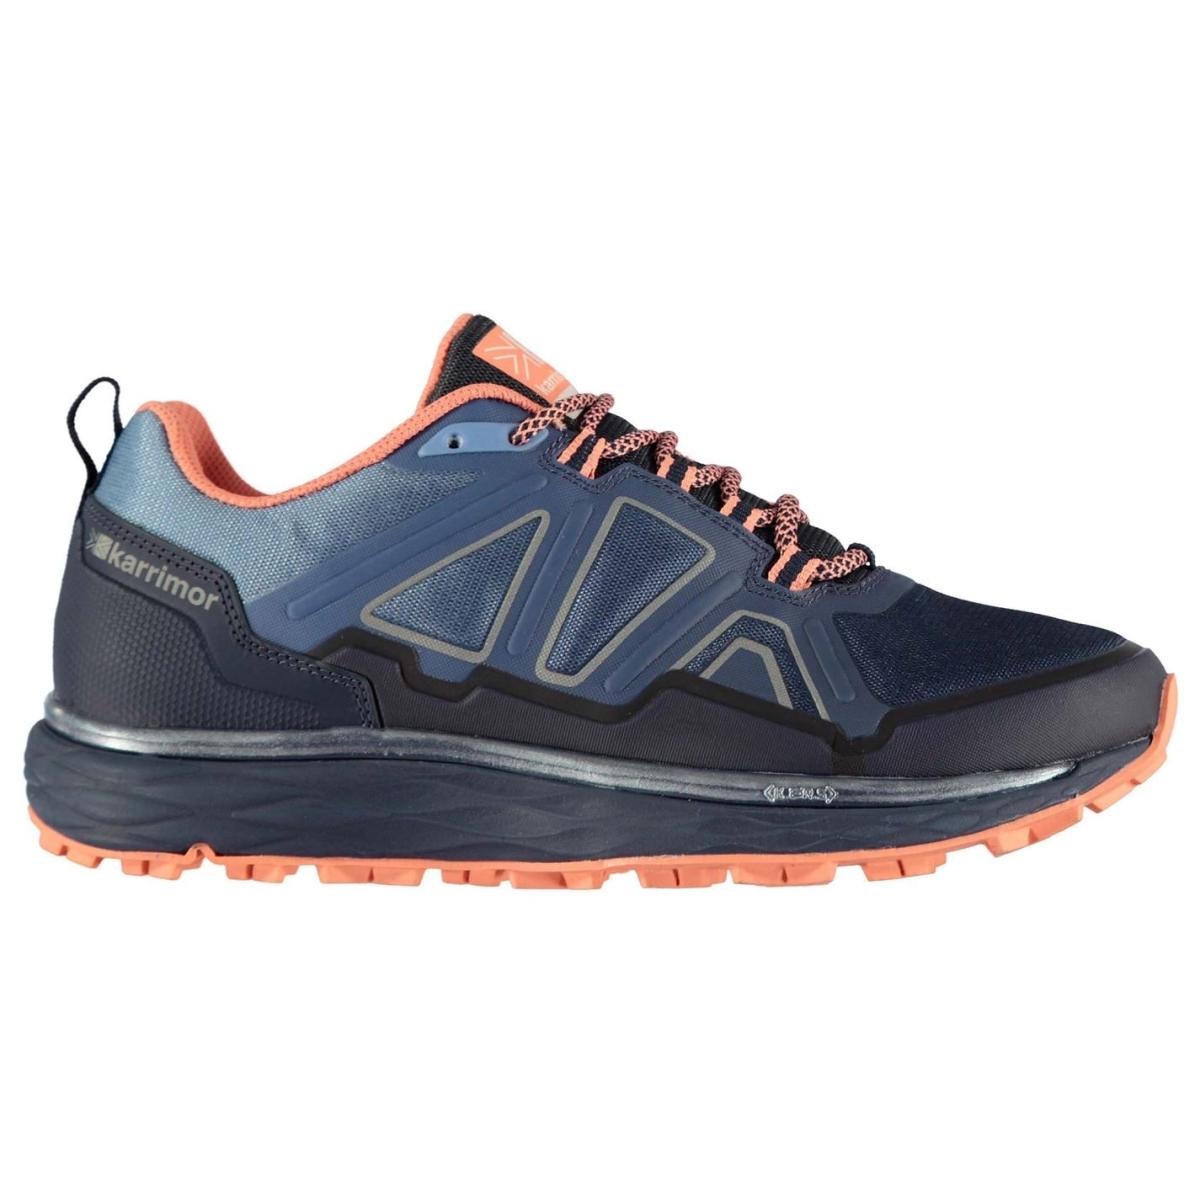 Karrimor Rapid 2 Laufschuhe Damen Sportschuhe Turnschuhe Jogging 4817